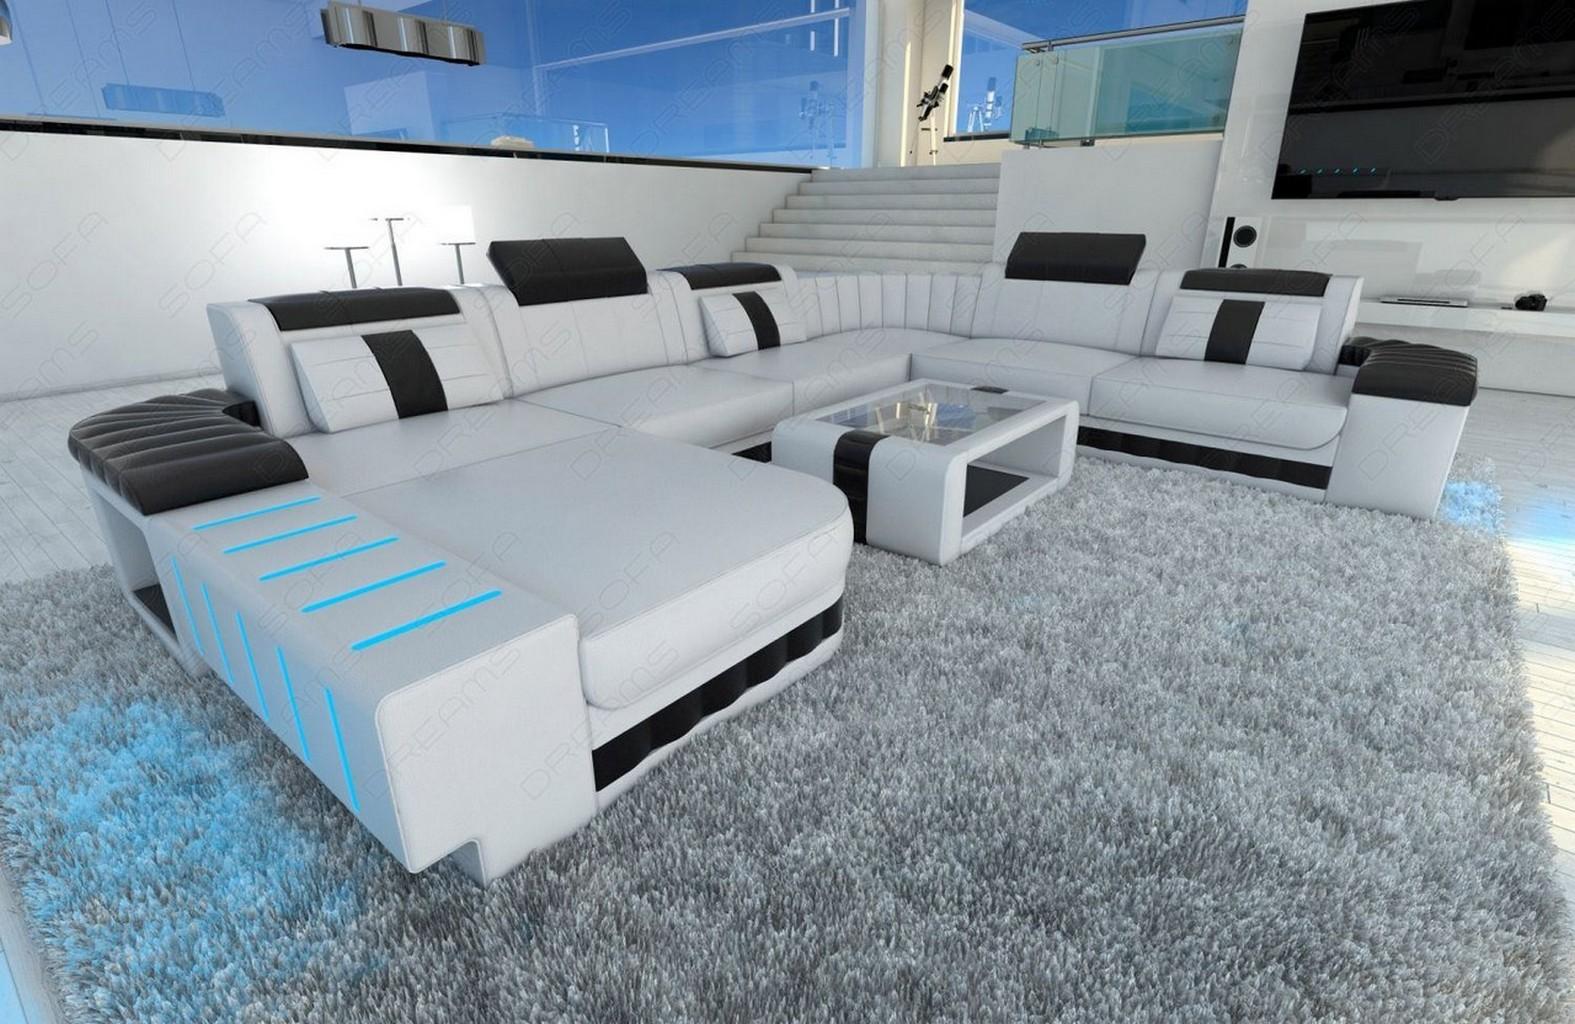 xxl sectional sofa bellagio led u shaped white black ebay. Black Bedroom Furniture Sets. Home Design Ideas